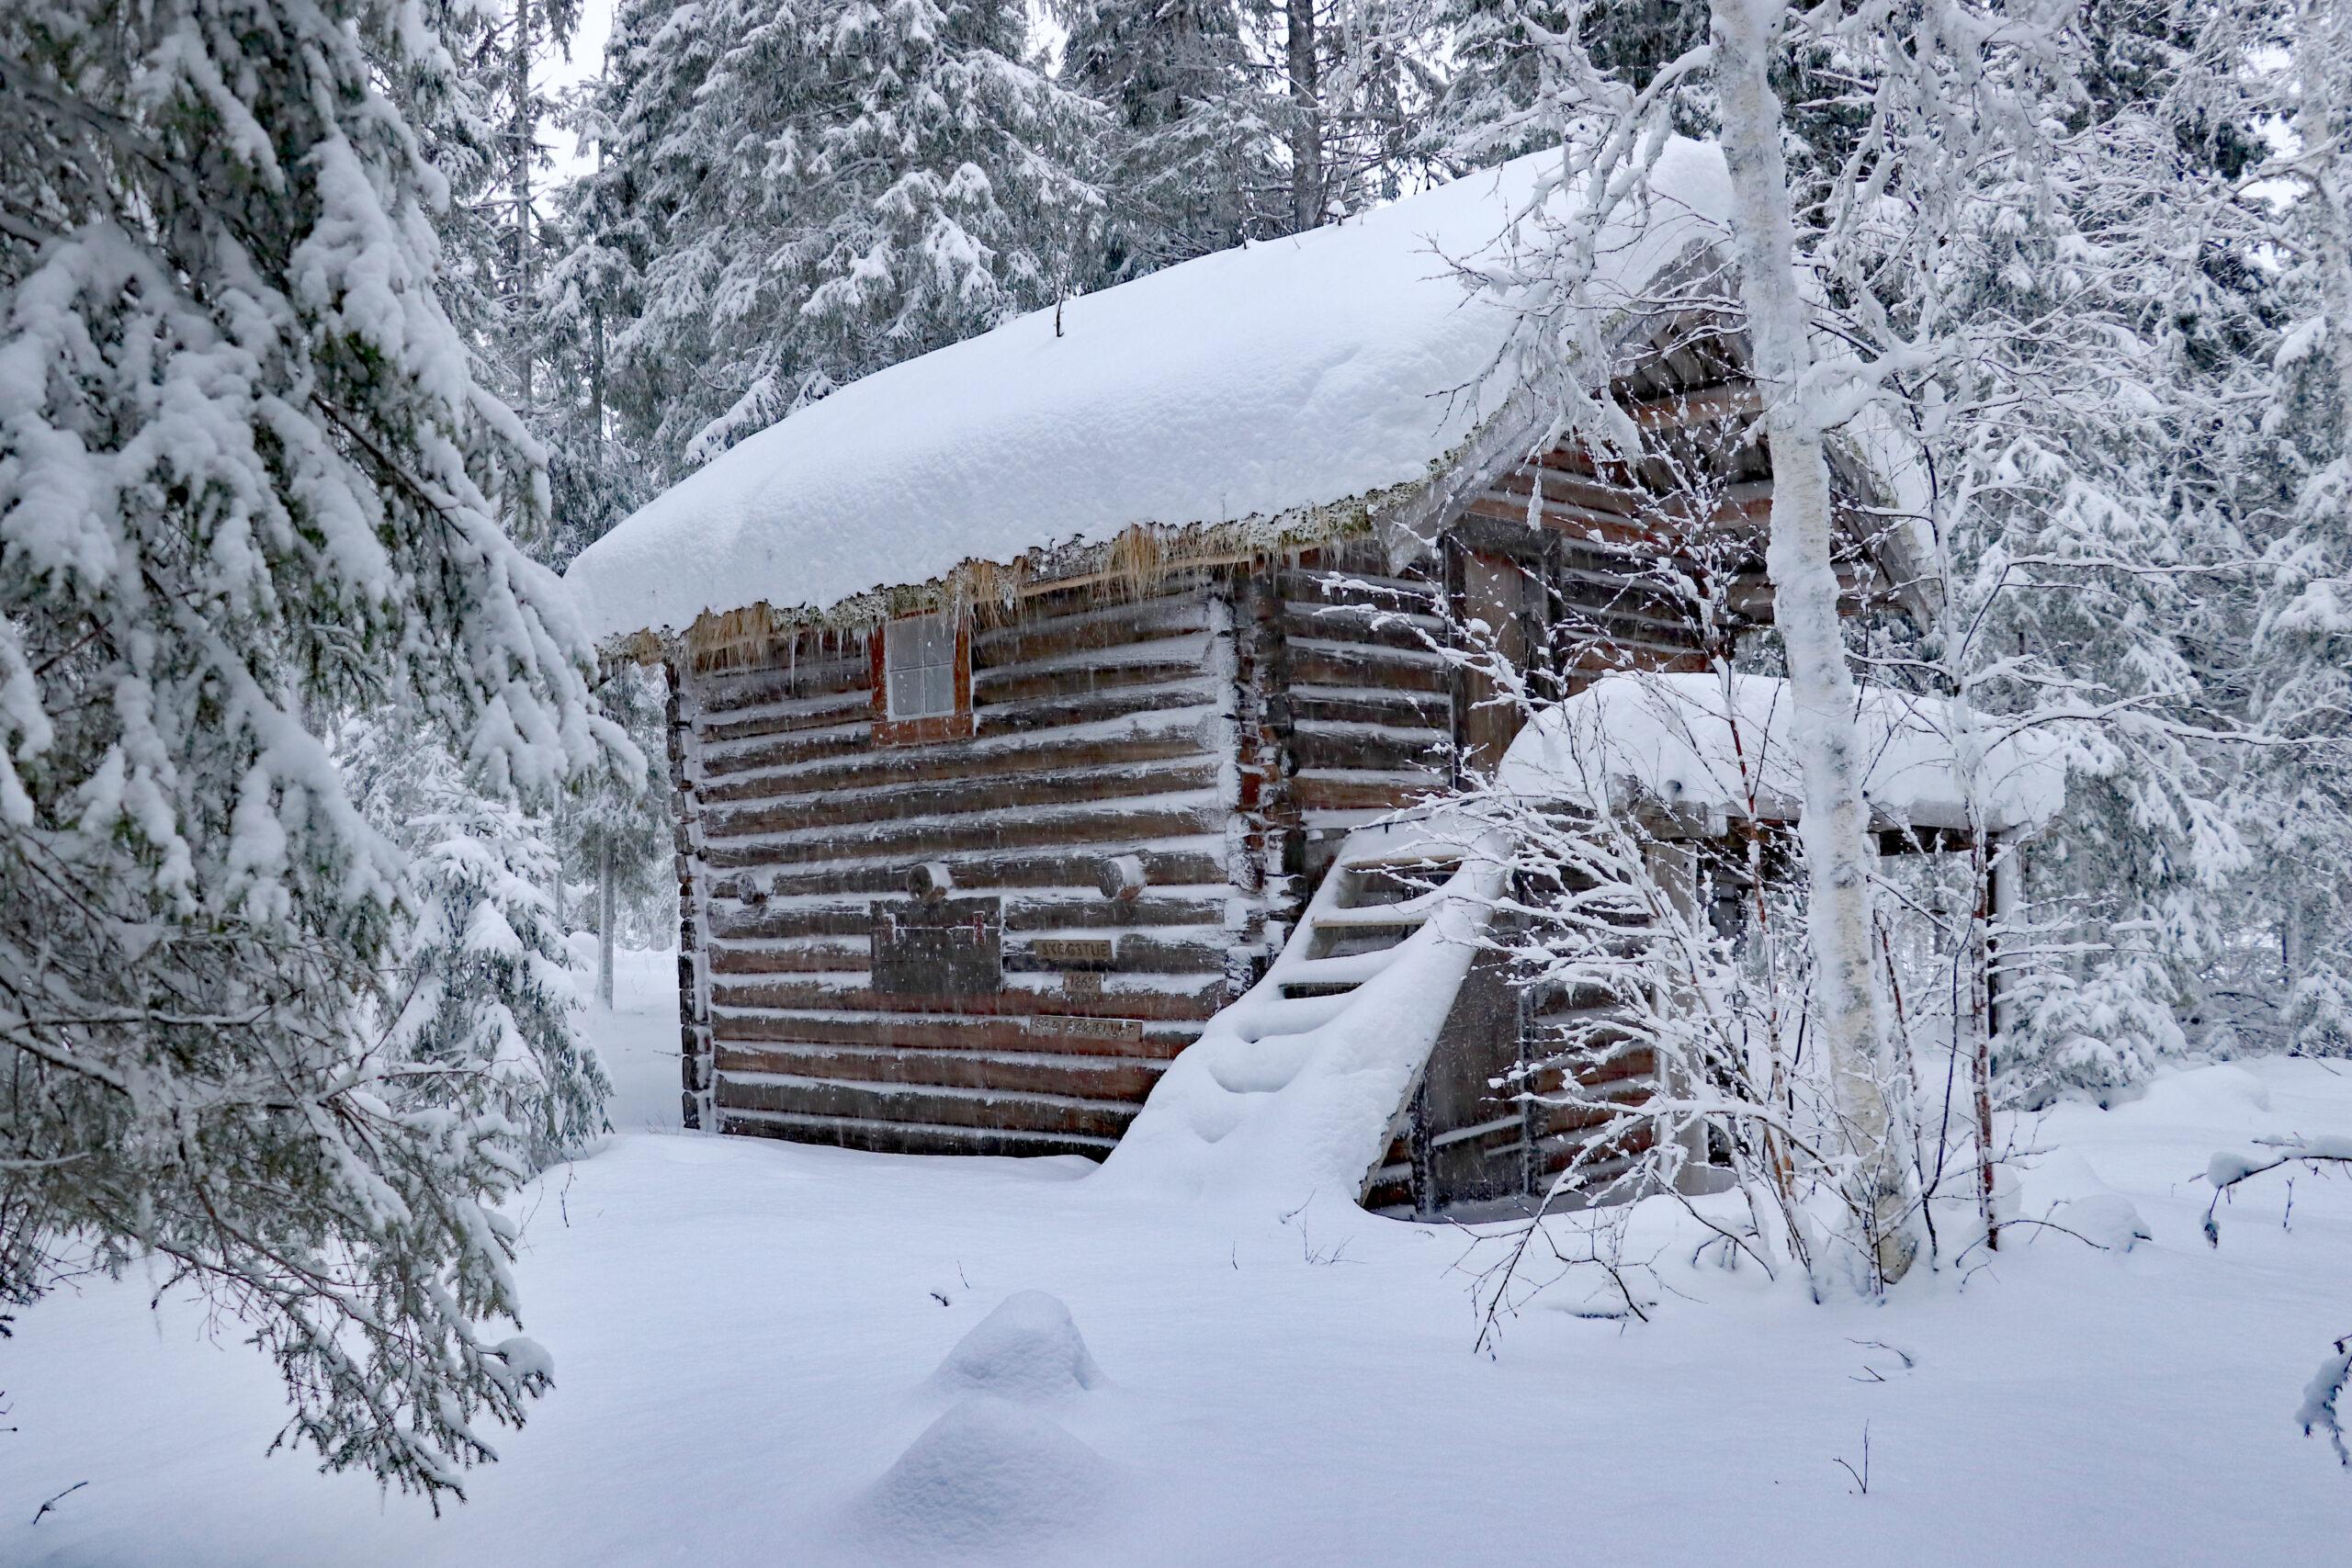 Viser skogsstua på Grane bygdetun med snø på taket